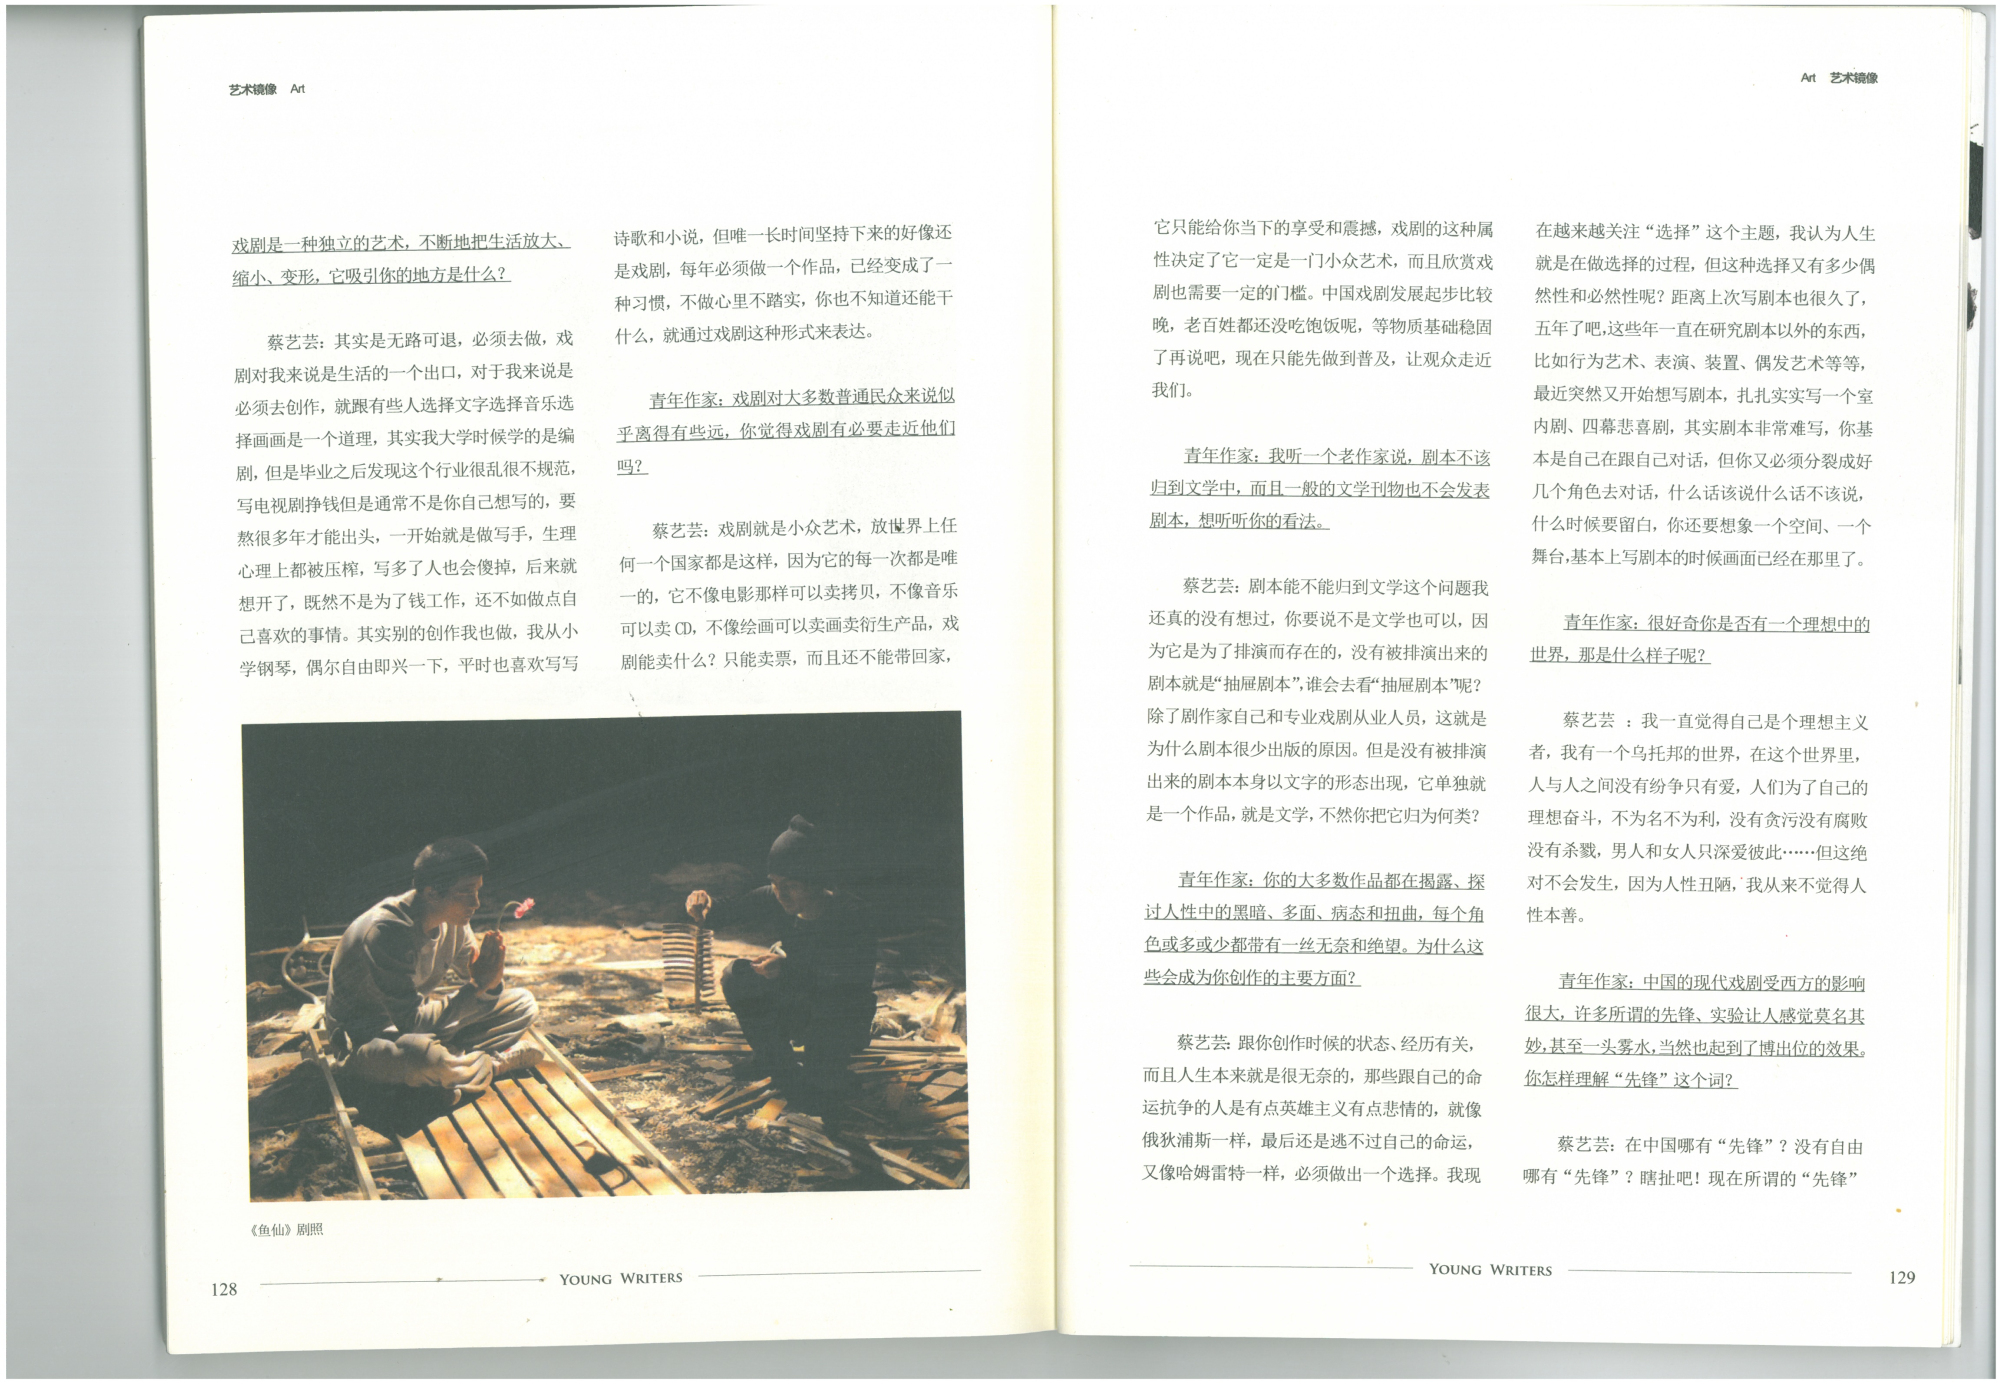 http://www.caiyiyun.com/files/gimgs/33_s45c-315081022582.jpg